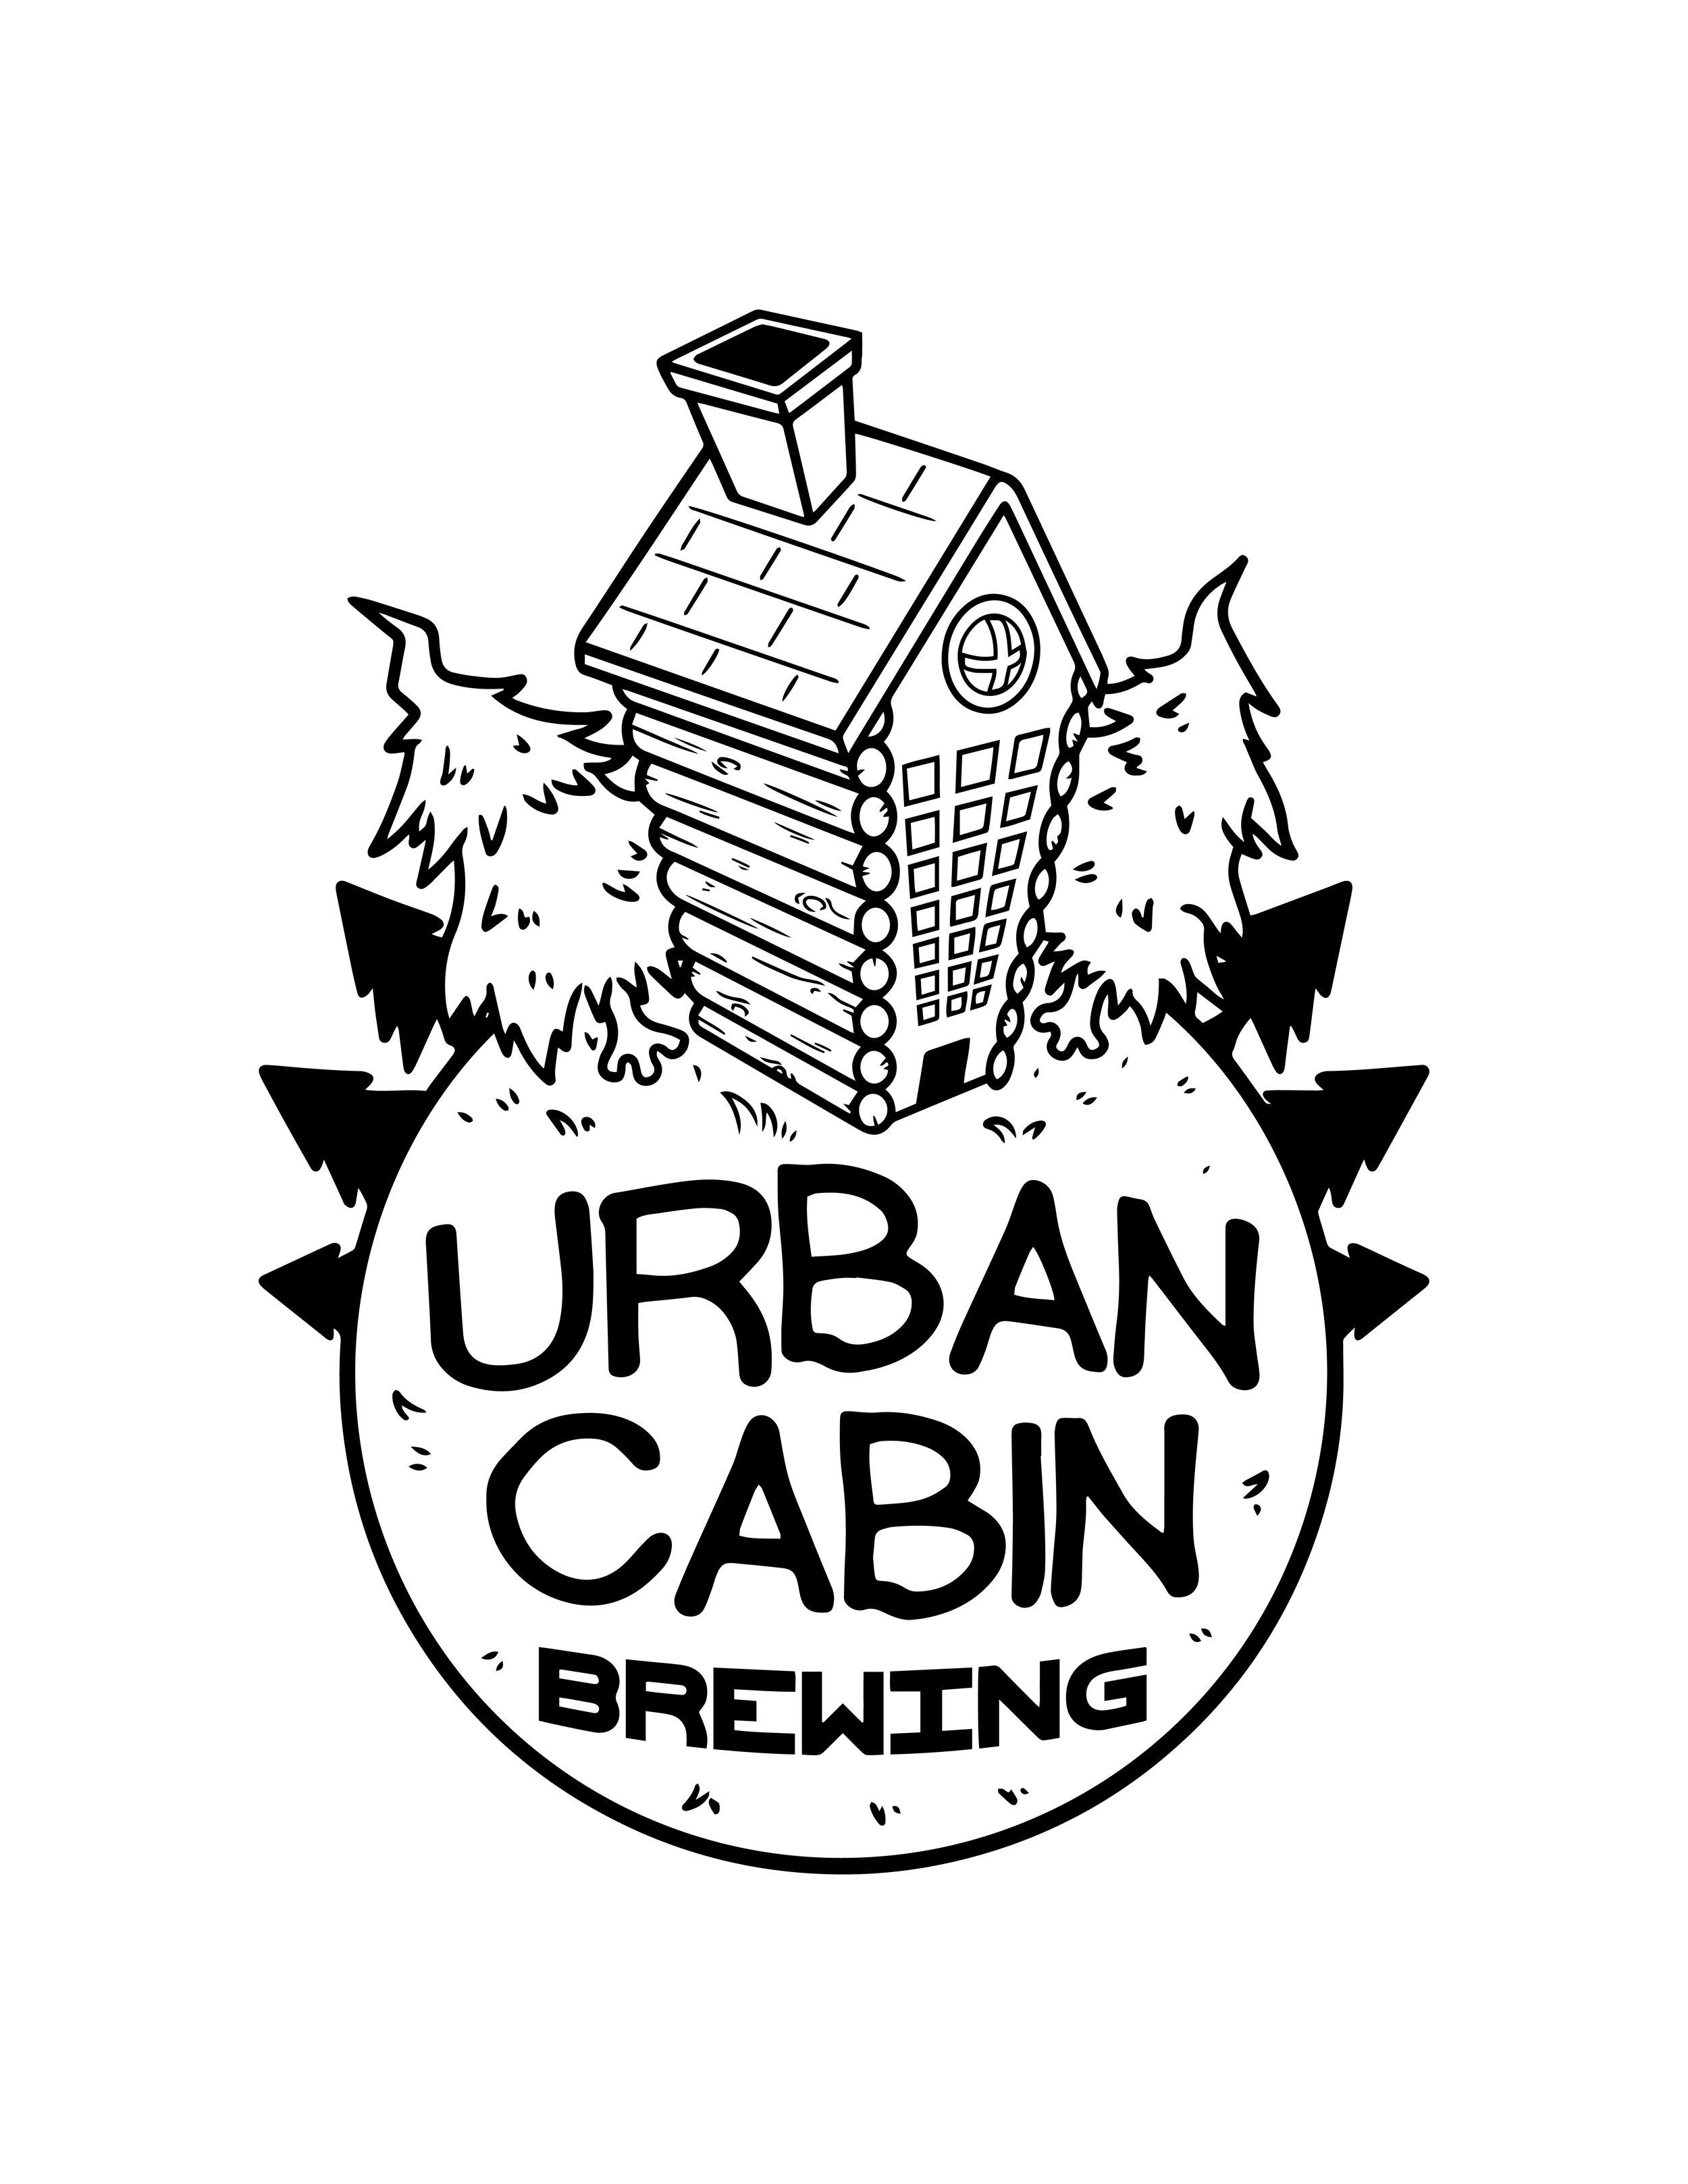 urbancabinbreweryfinalblack-01.jpg